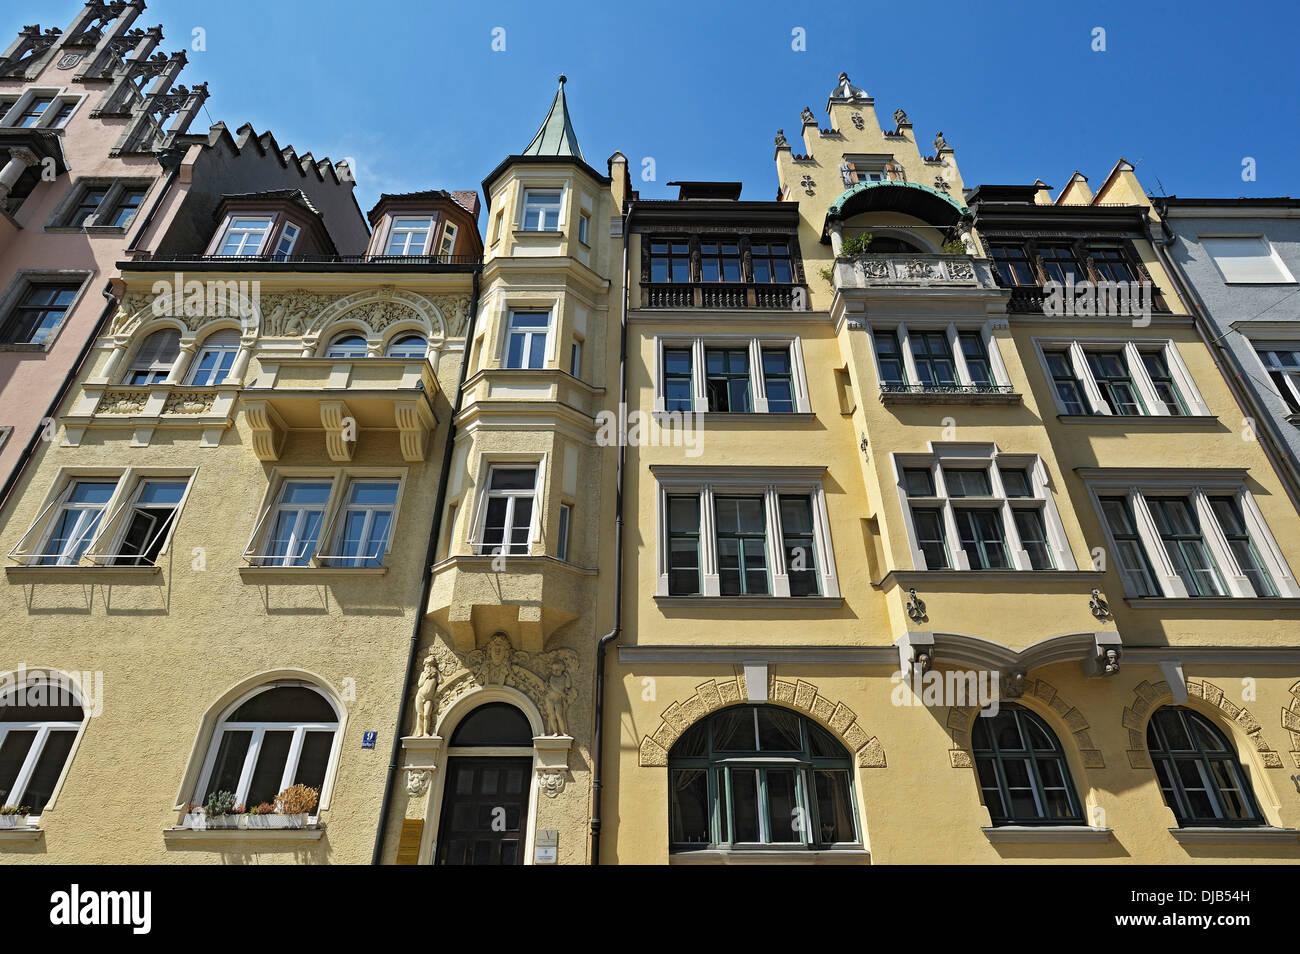 Edificio neorenacentista en Richard-Wagner-Strasse 9, izquierda, Munich, Baviera, Alemania Imagen De Stock